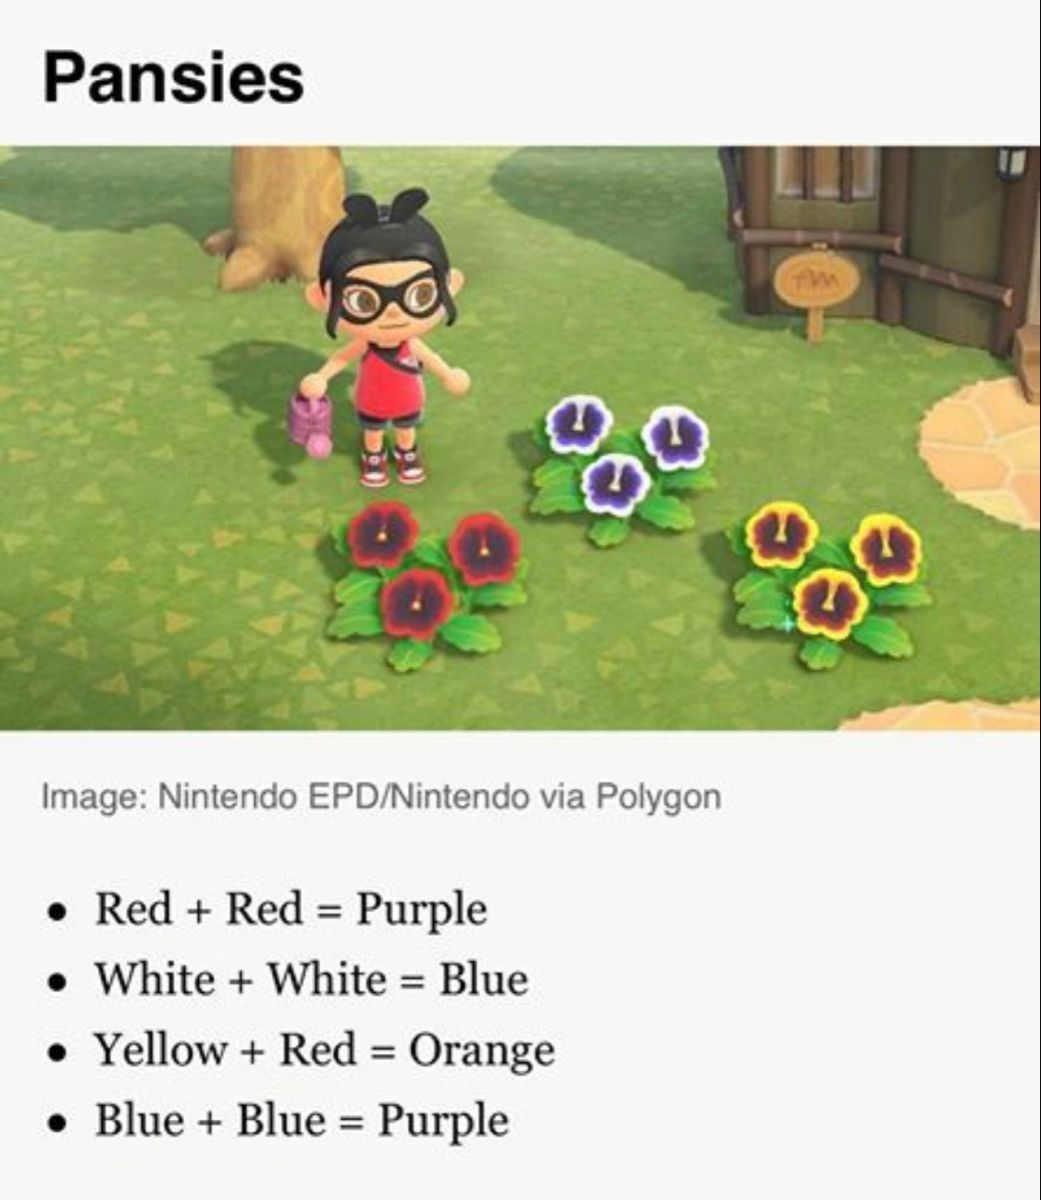 Acnh Flower Hybrid Guide In 2020 Animal Crossing Game Animal Crossing New Animal Crossing